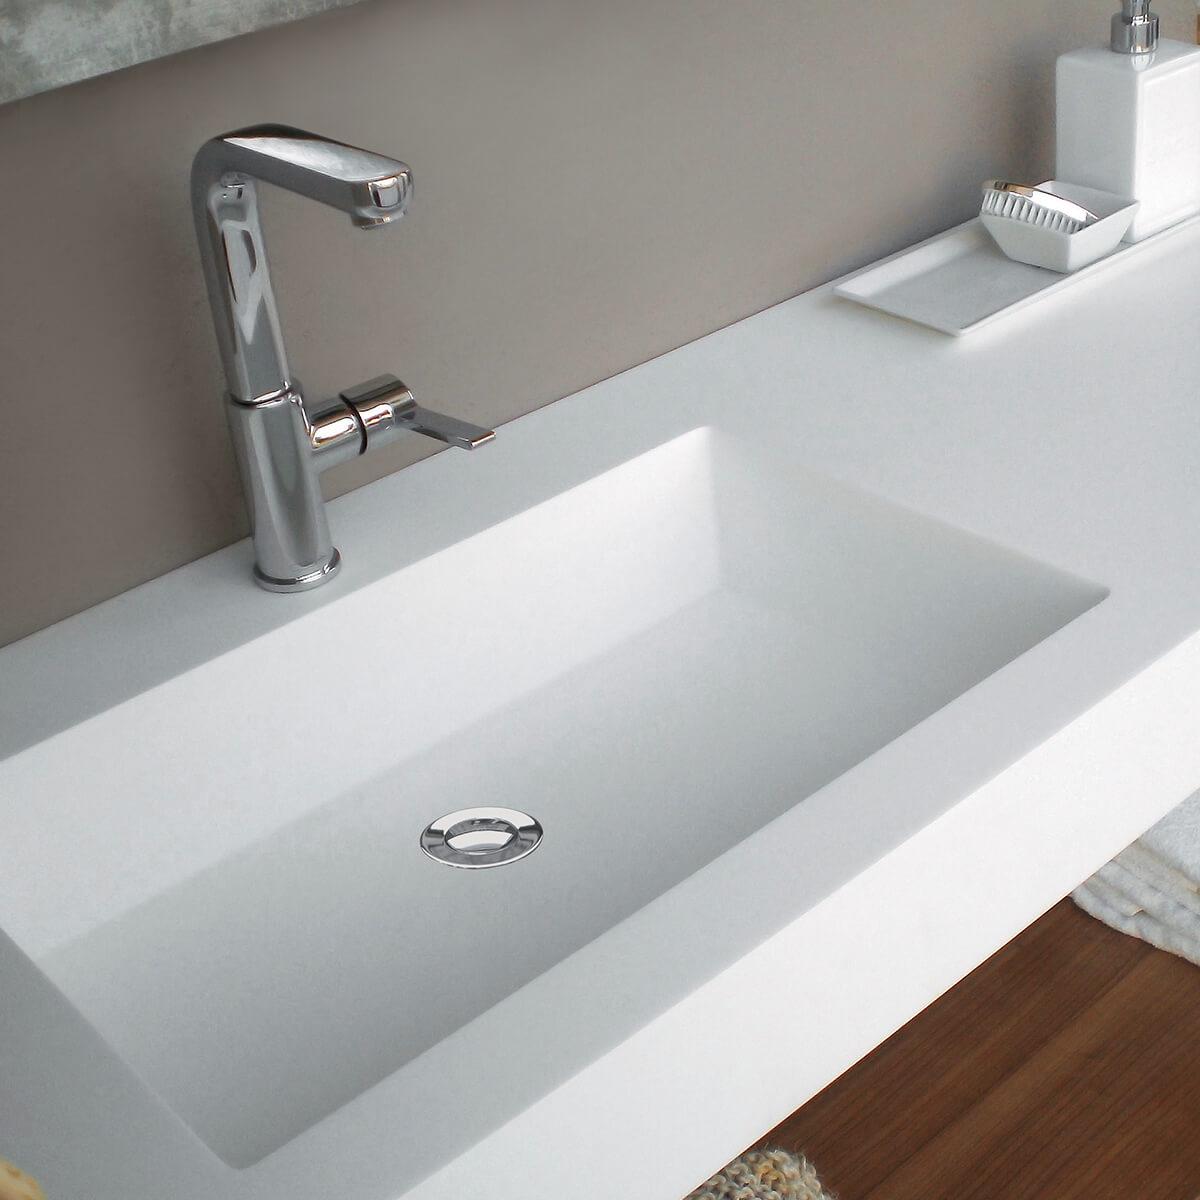 CASF corian basin smooth 8110 bathroom